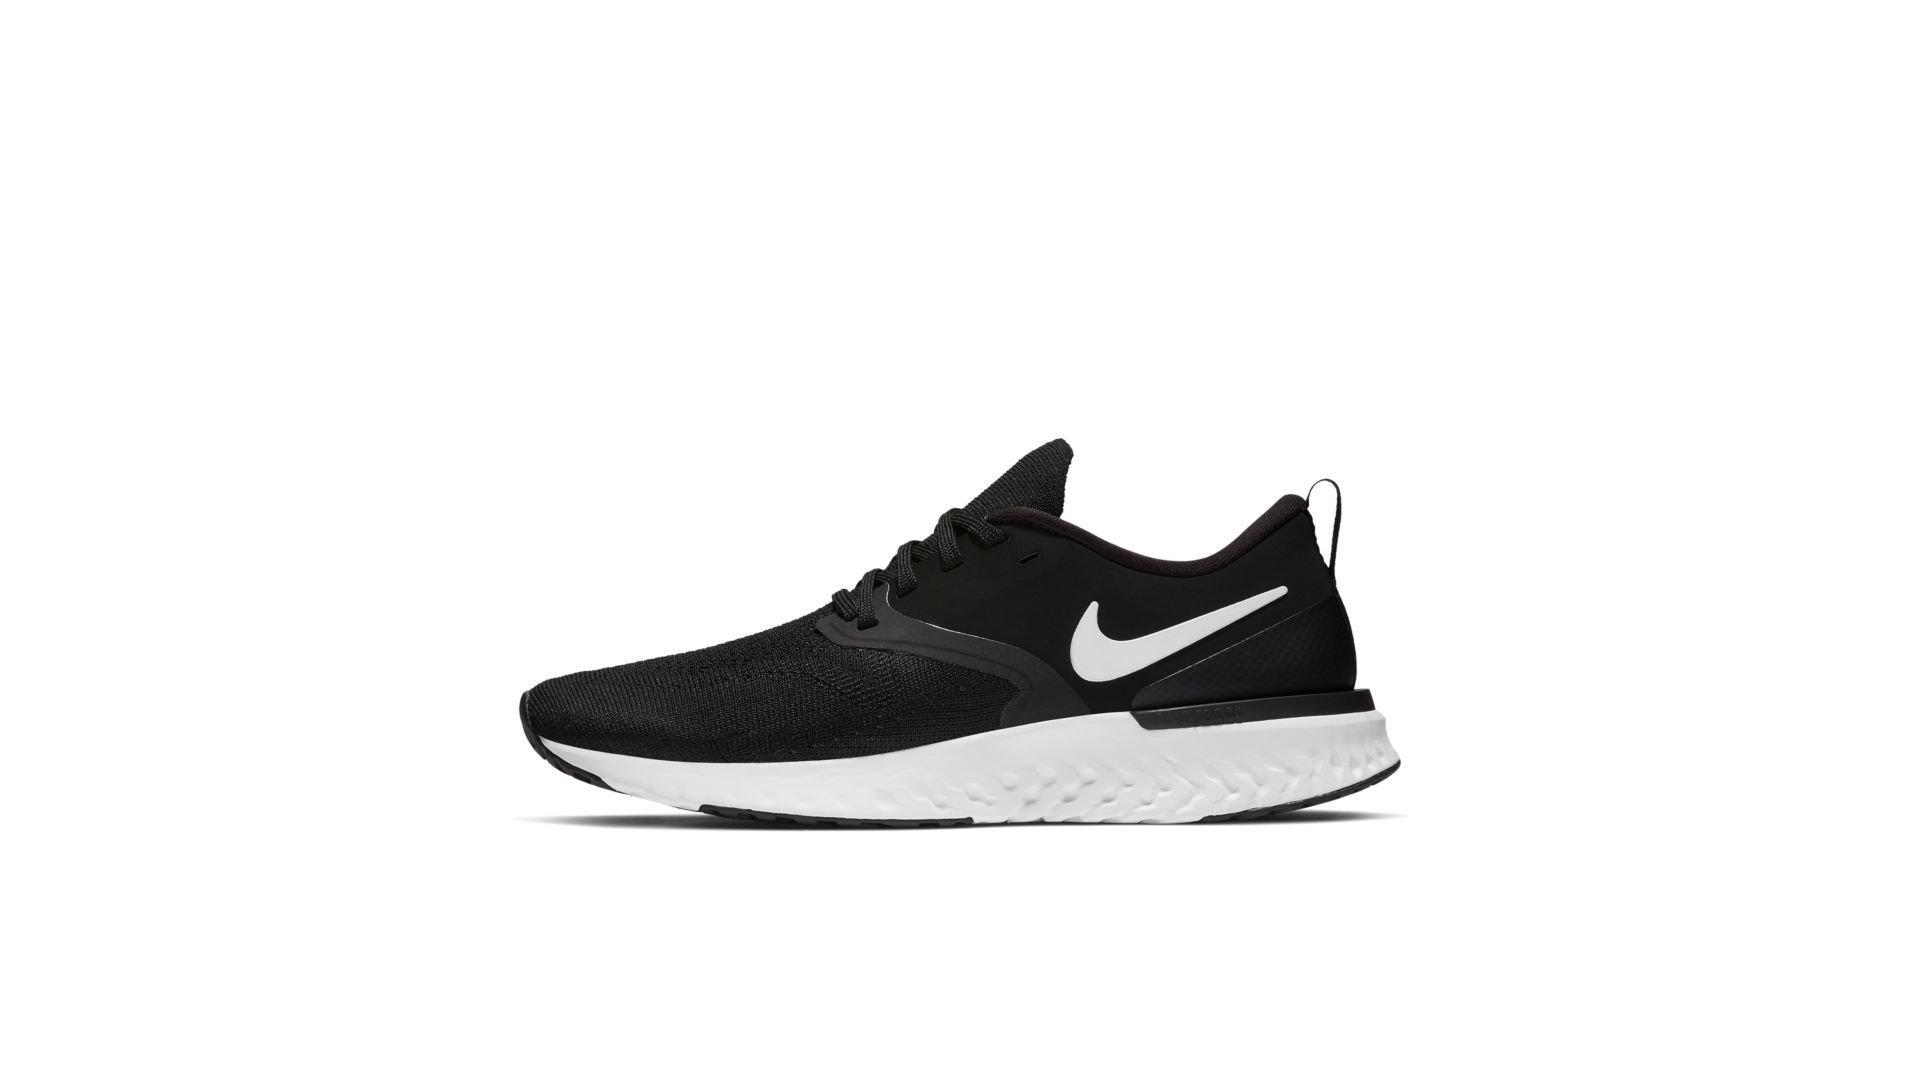 Nike Odyssey React 2 Flyknit Black White (W) (AH1016-010)